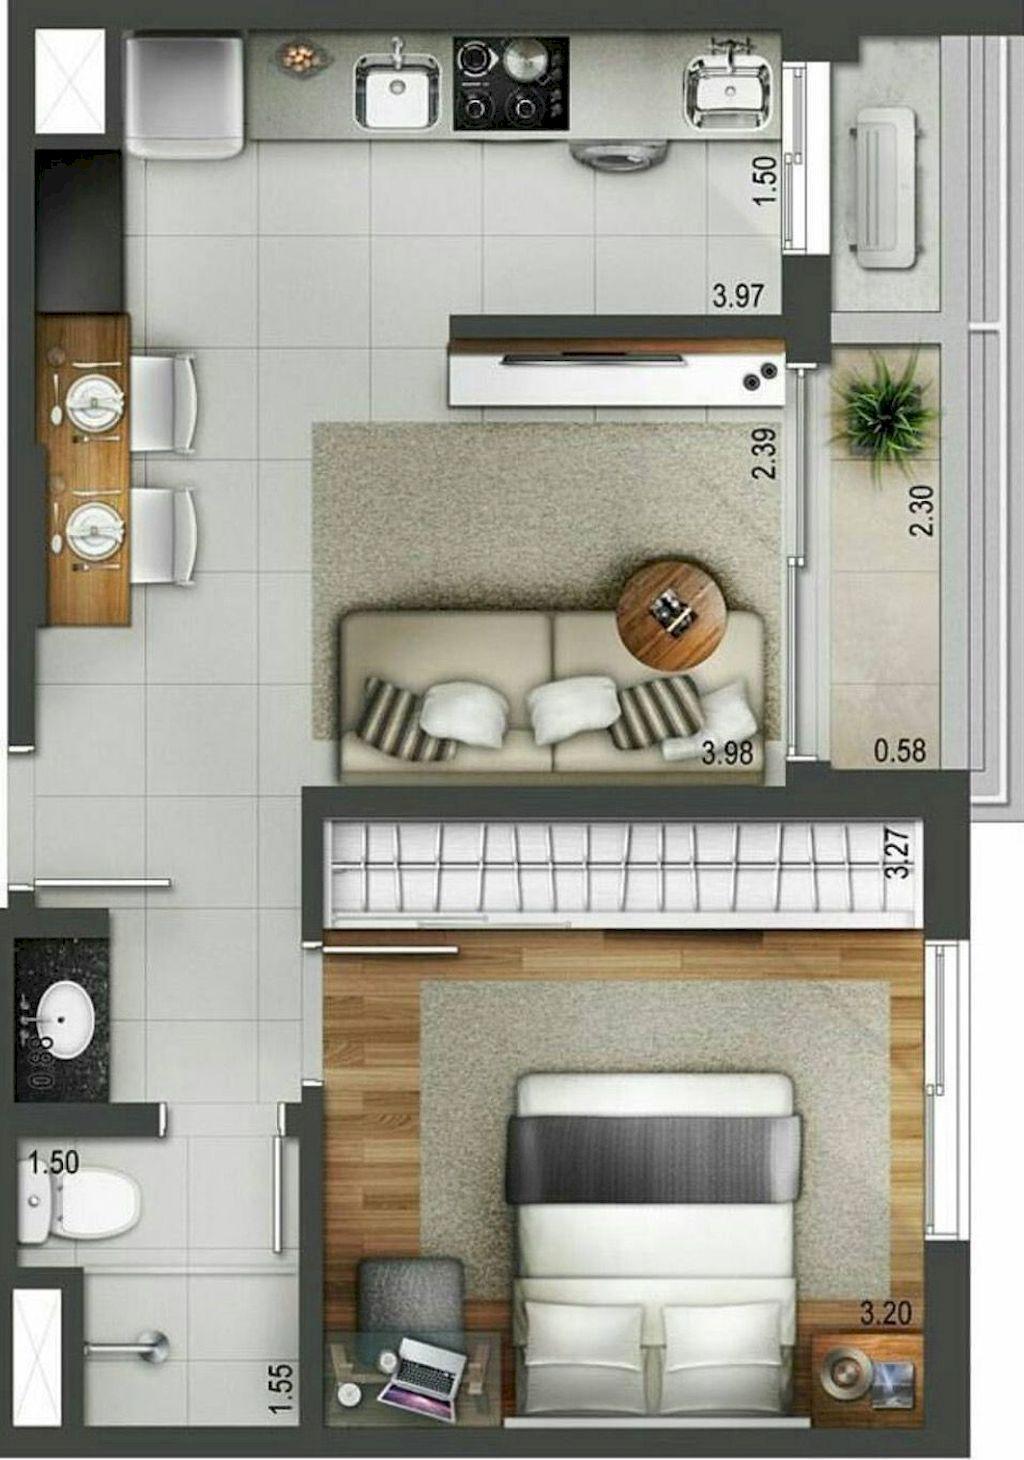 Small apartment plans interior design layout house also casa de interes social life in rh pinterest